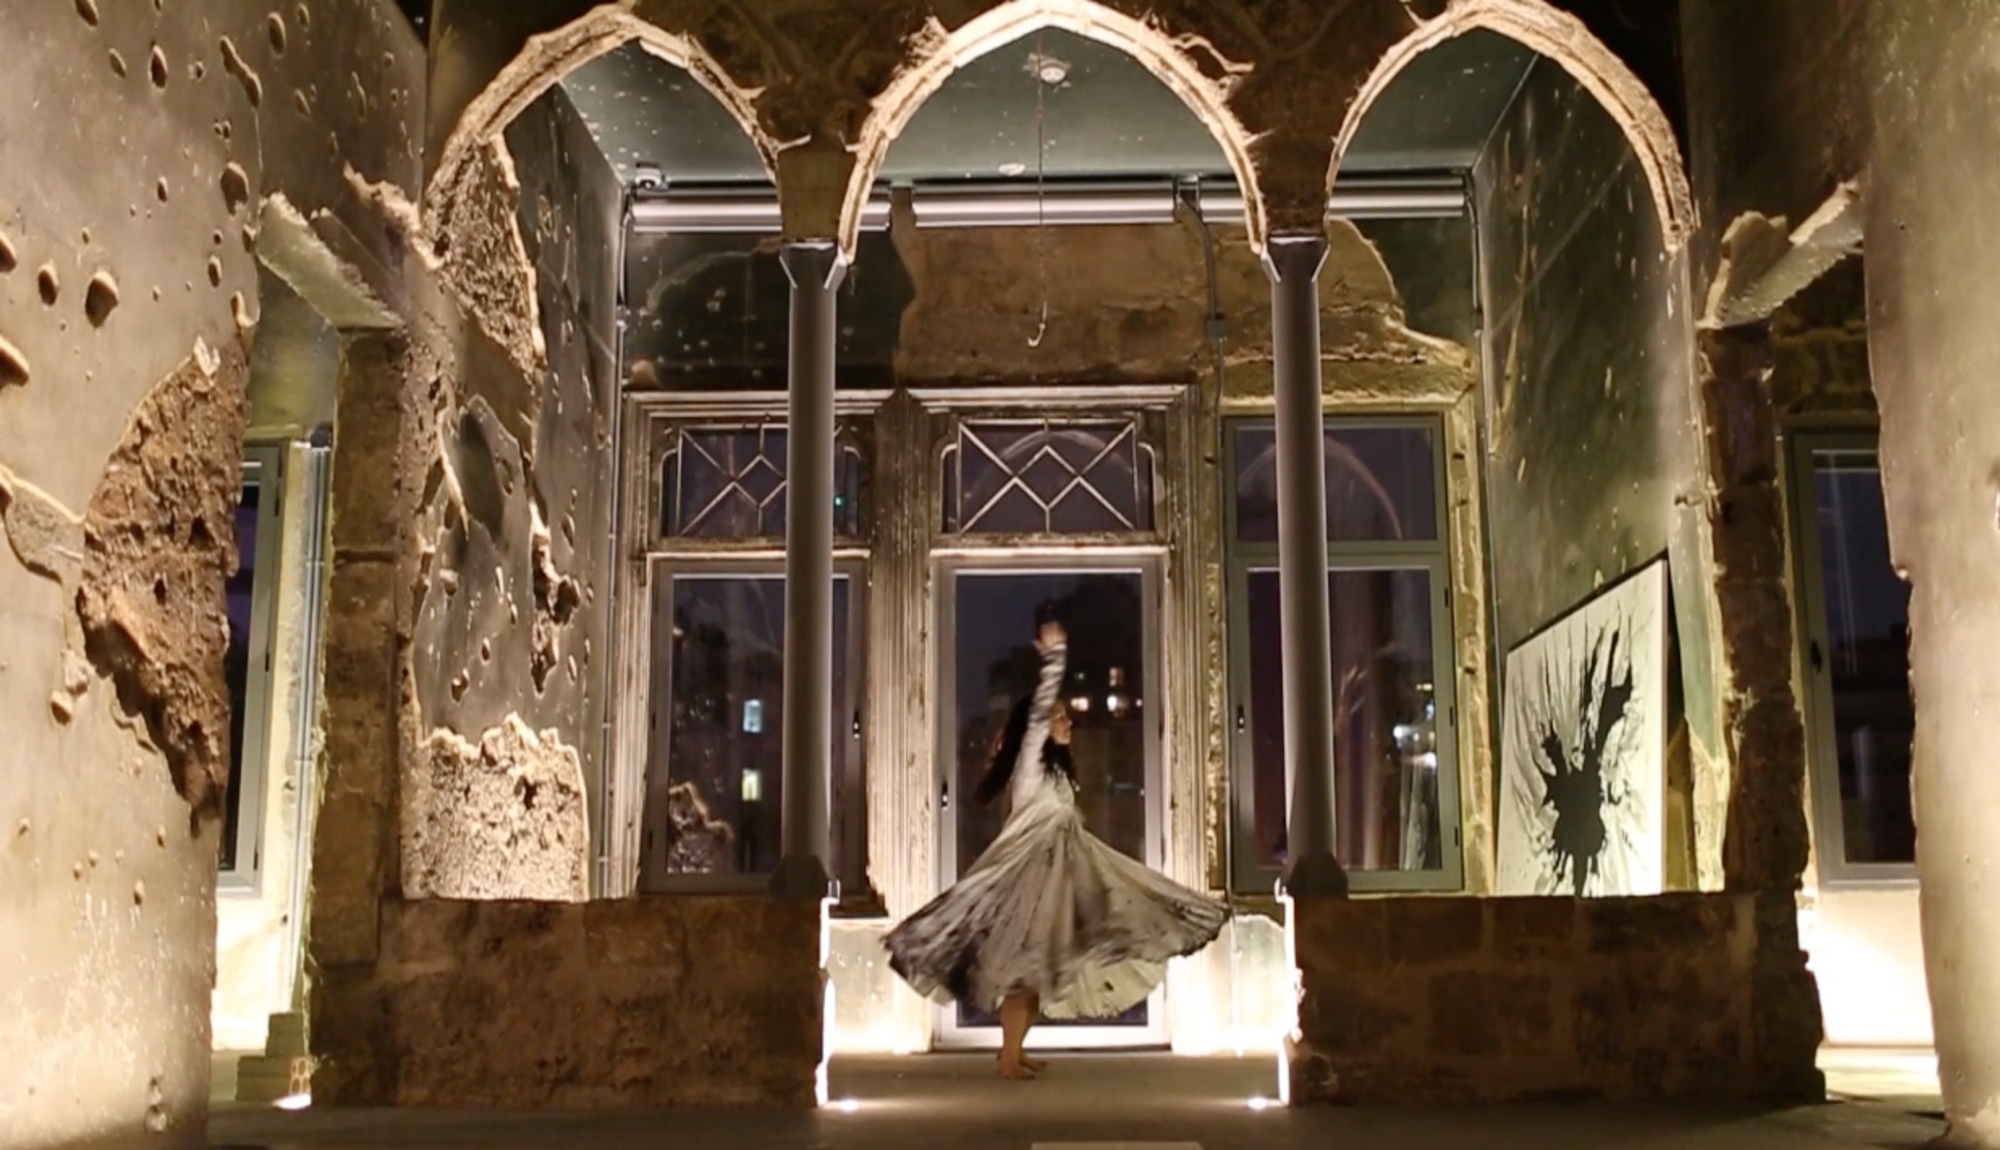 Zena el Khalil stages Healing Lebanon in historic building Beit Beirut, in Beirut, Lebanon.